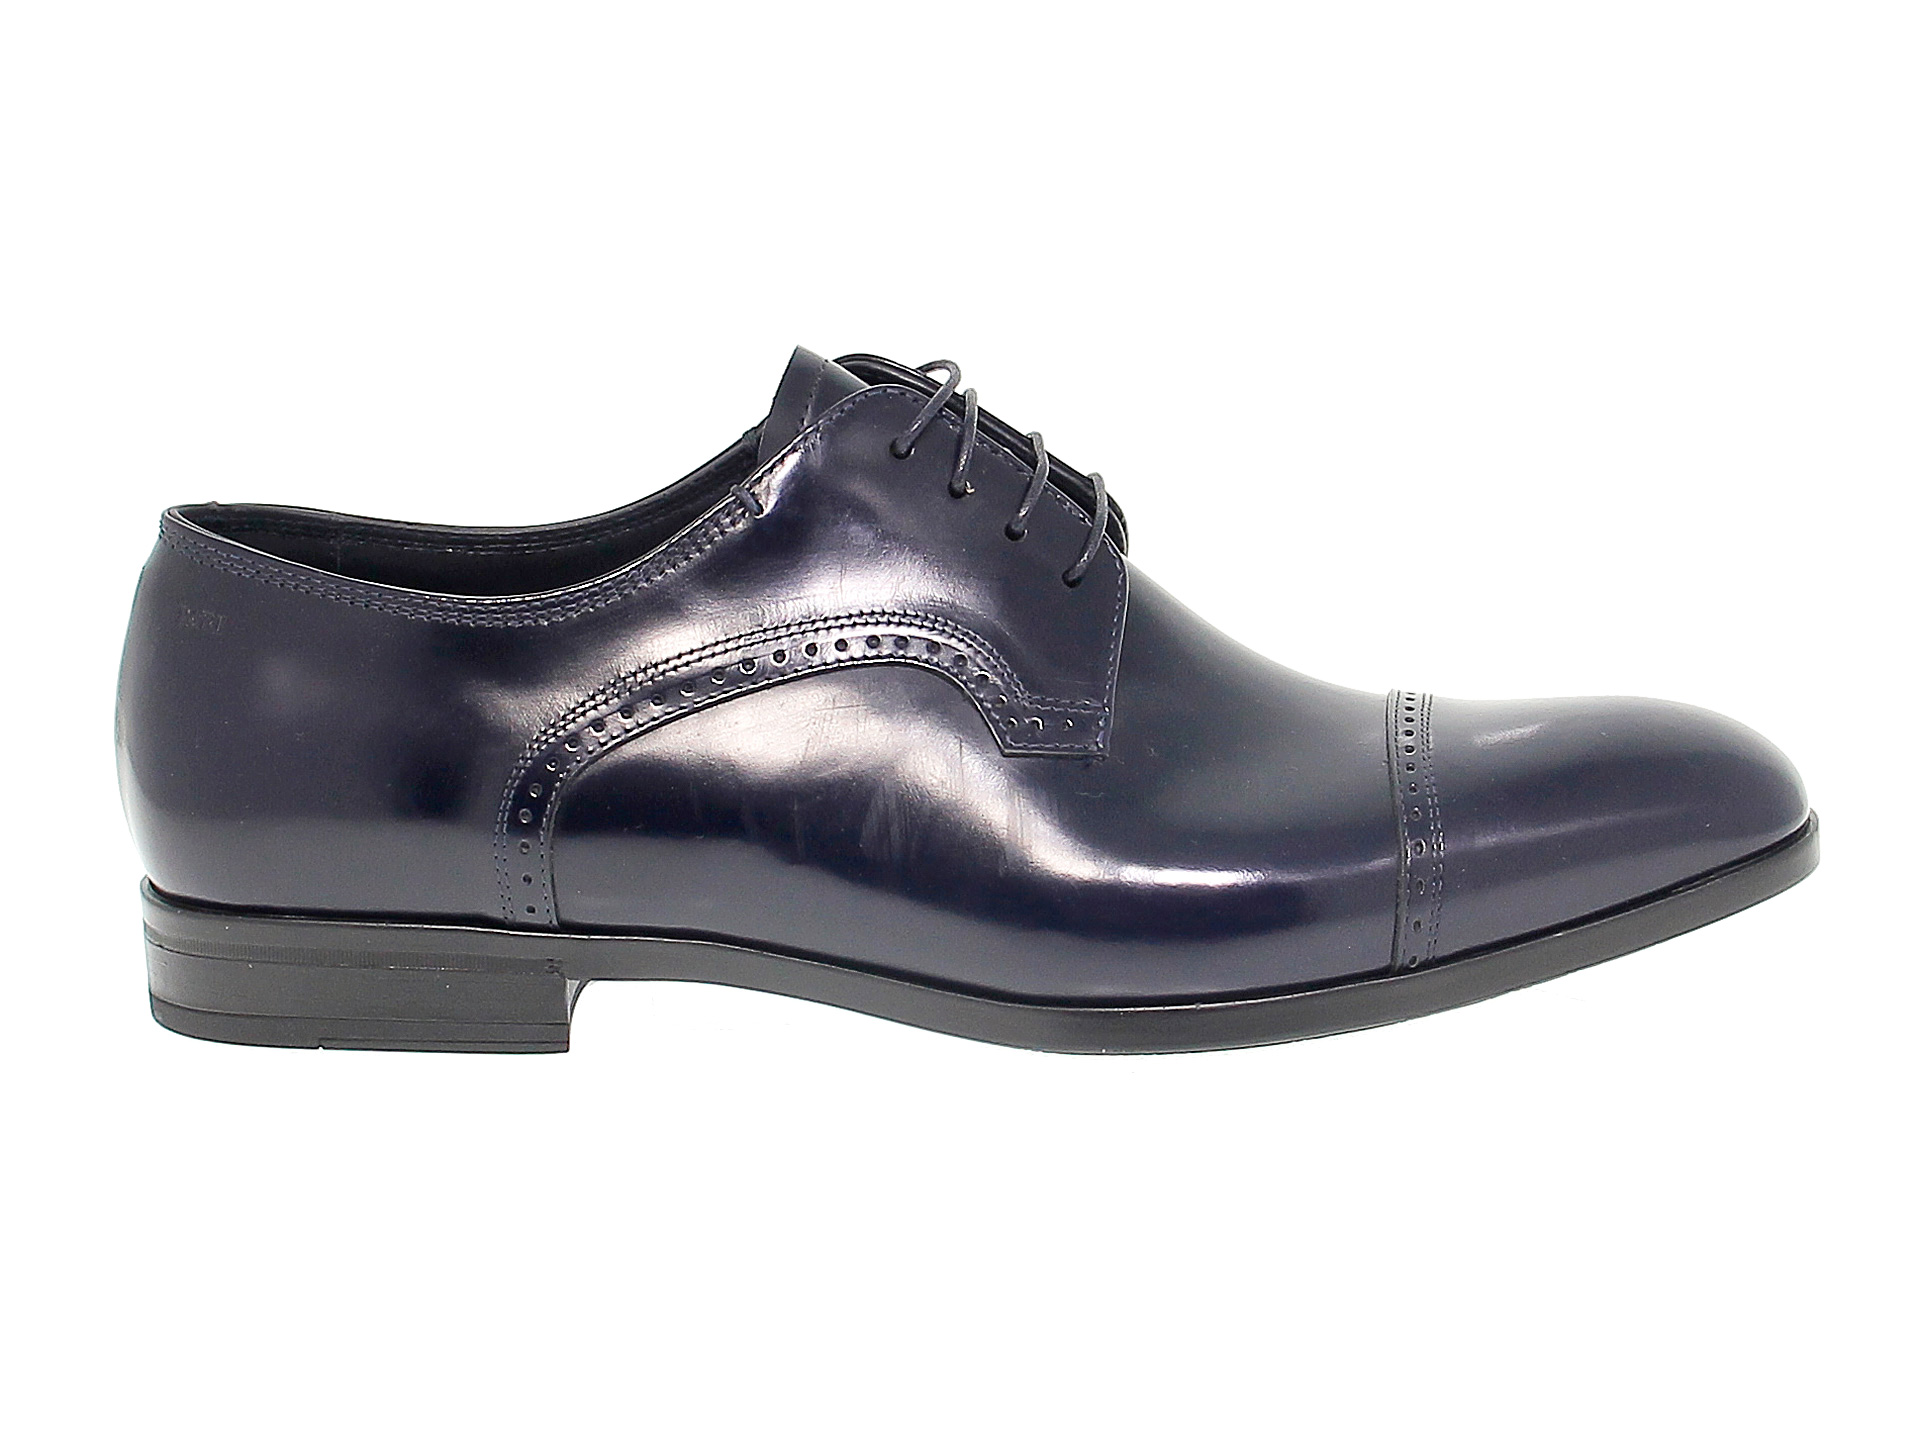 Firenze À En Fabi Chaussures Lacets Peau wOym8vn0NP